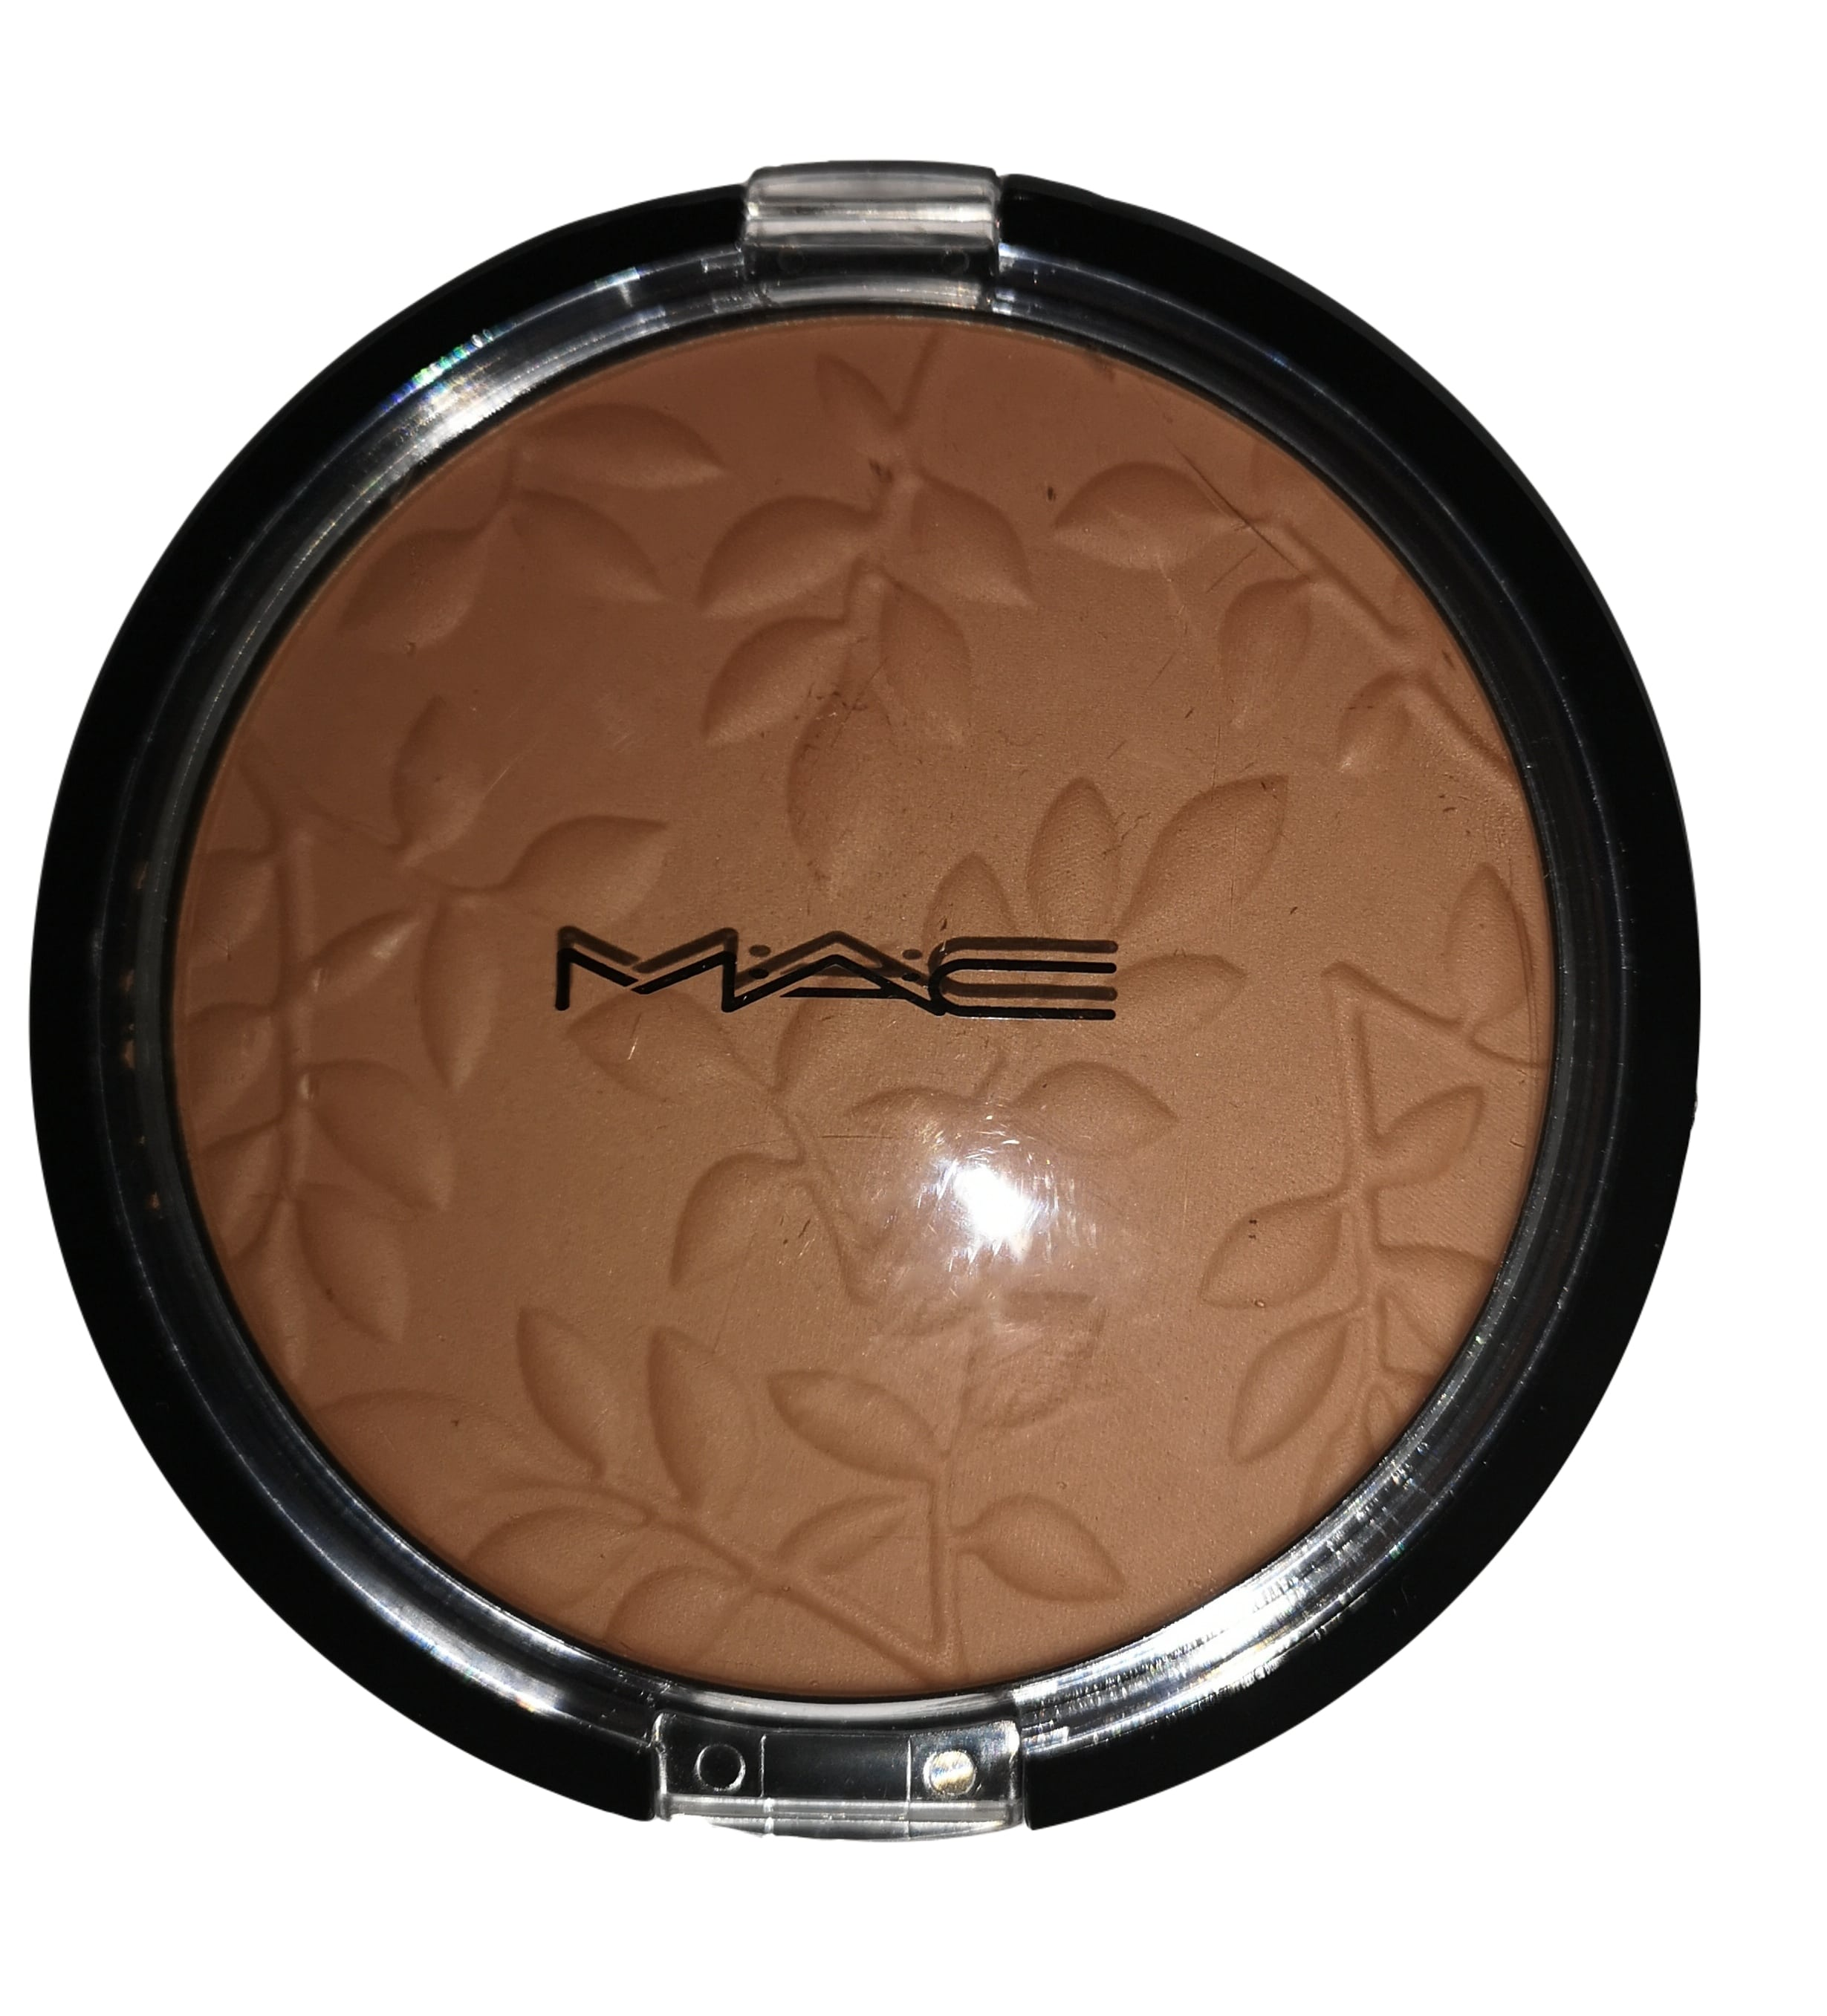 MAC MAXI  Bronzing Powder MEDIUM N.632 NET 35G